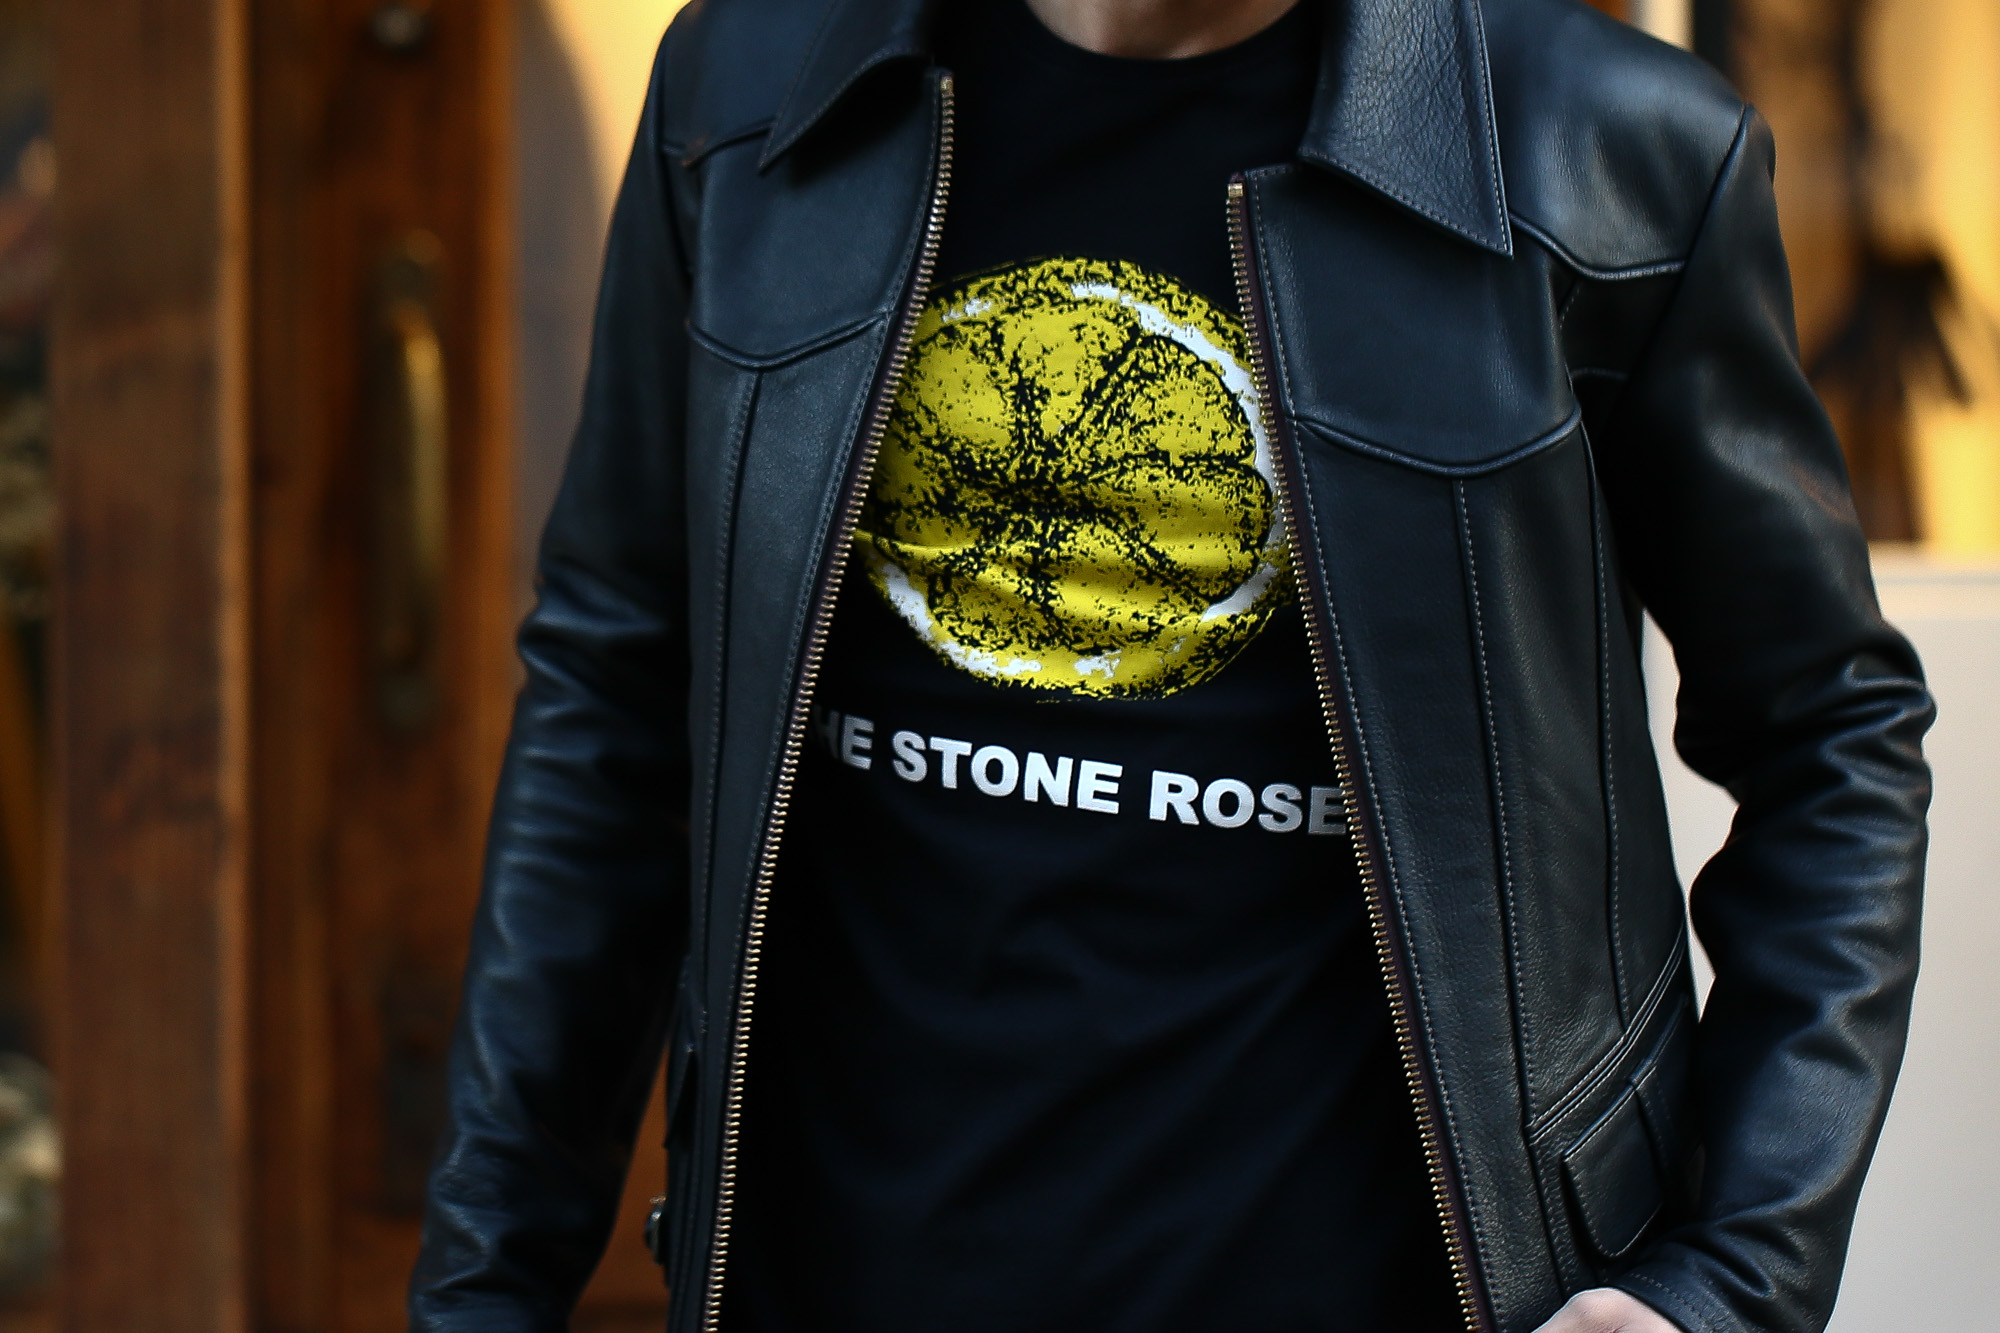 Worn By (ウォーンバイ) STONE ROSES LEMON ストーンローゼス レモン The Stone Roses ザ・ストーン・ローゼズ ロックTシャツ バンドTシャツ BLACK (ブラック) 2016 秋冬新作 XS,S,M コーディネート画像。 愛知 名古屋 ZODIAC ゾディアック バンドT ロックT プリントT ウォーンバイ ライセンスTシャツ VAN バン 名古屋